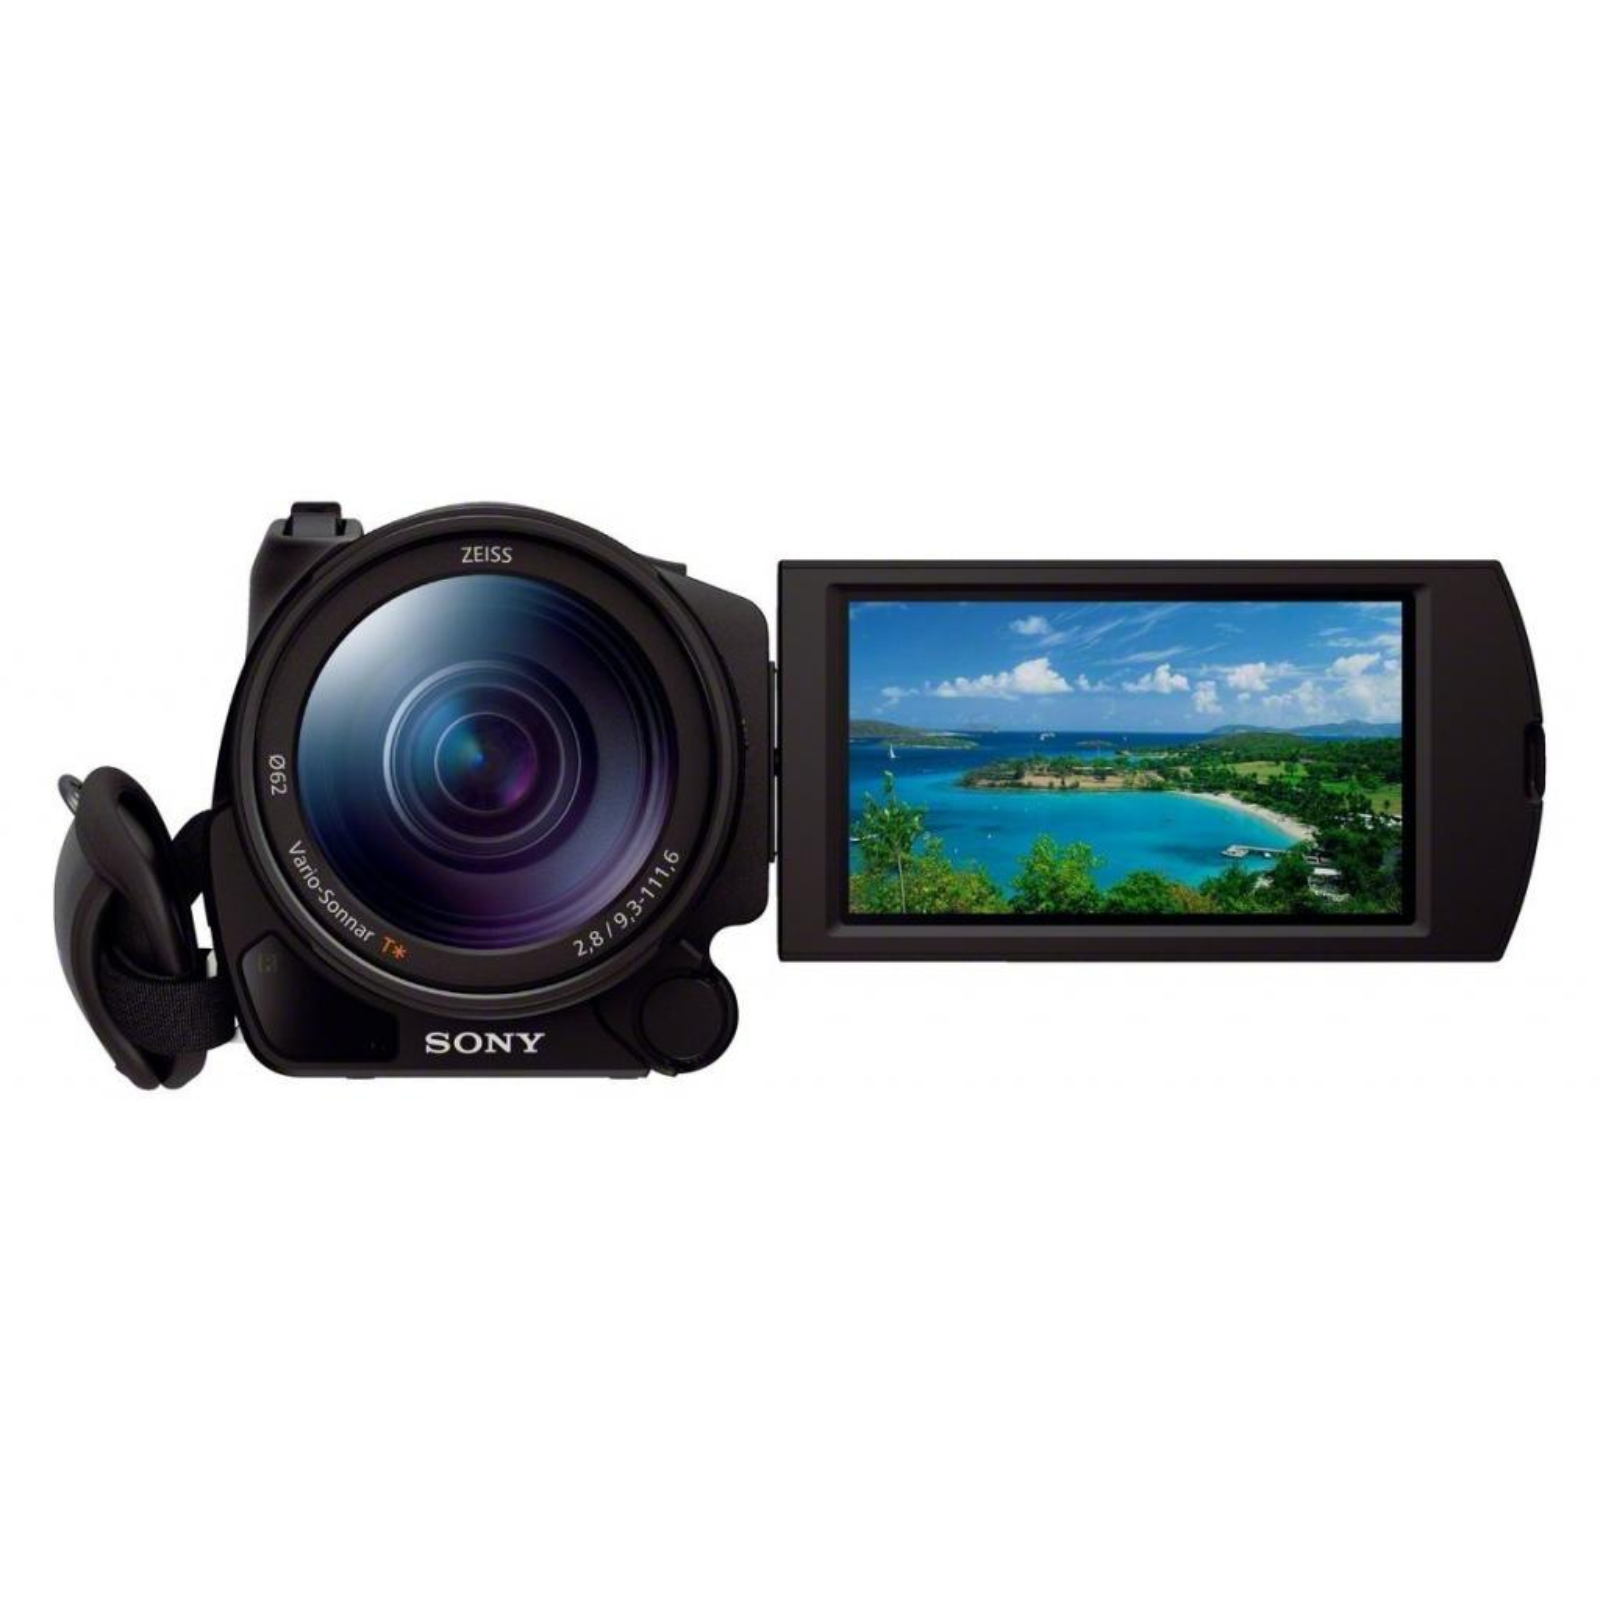 Цифровая видеокамера SONY Handycam HDR-CX900 Black (HDRCX900EB.CEN) изображение 4